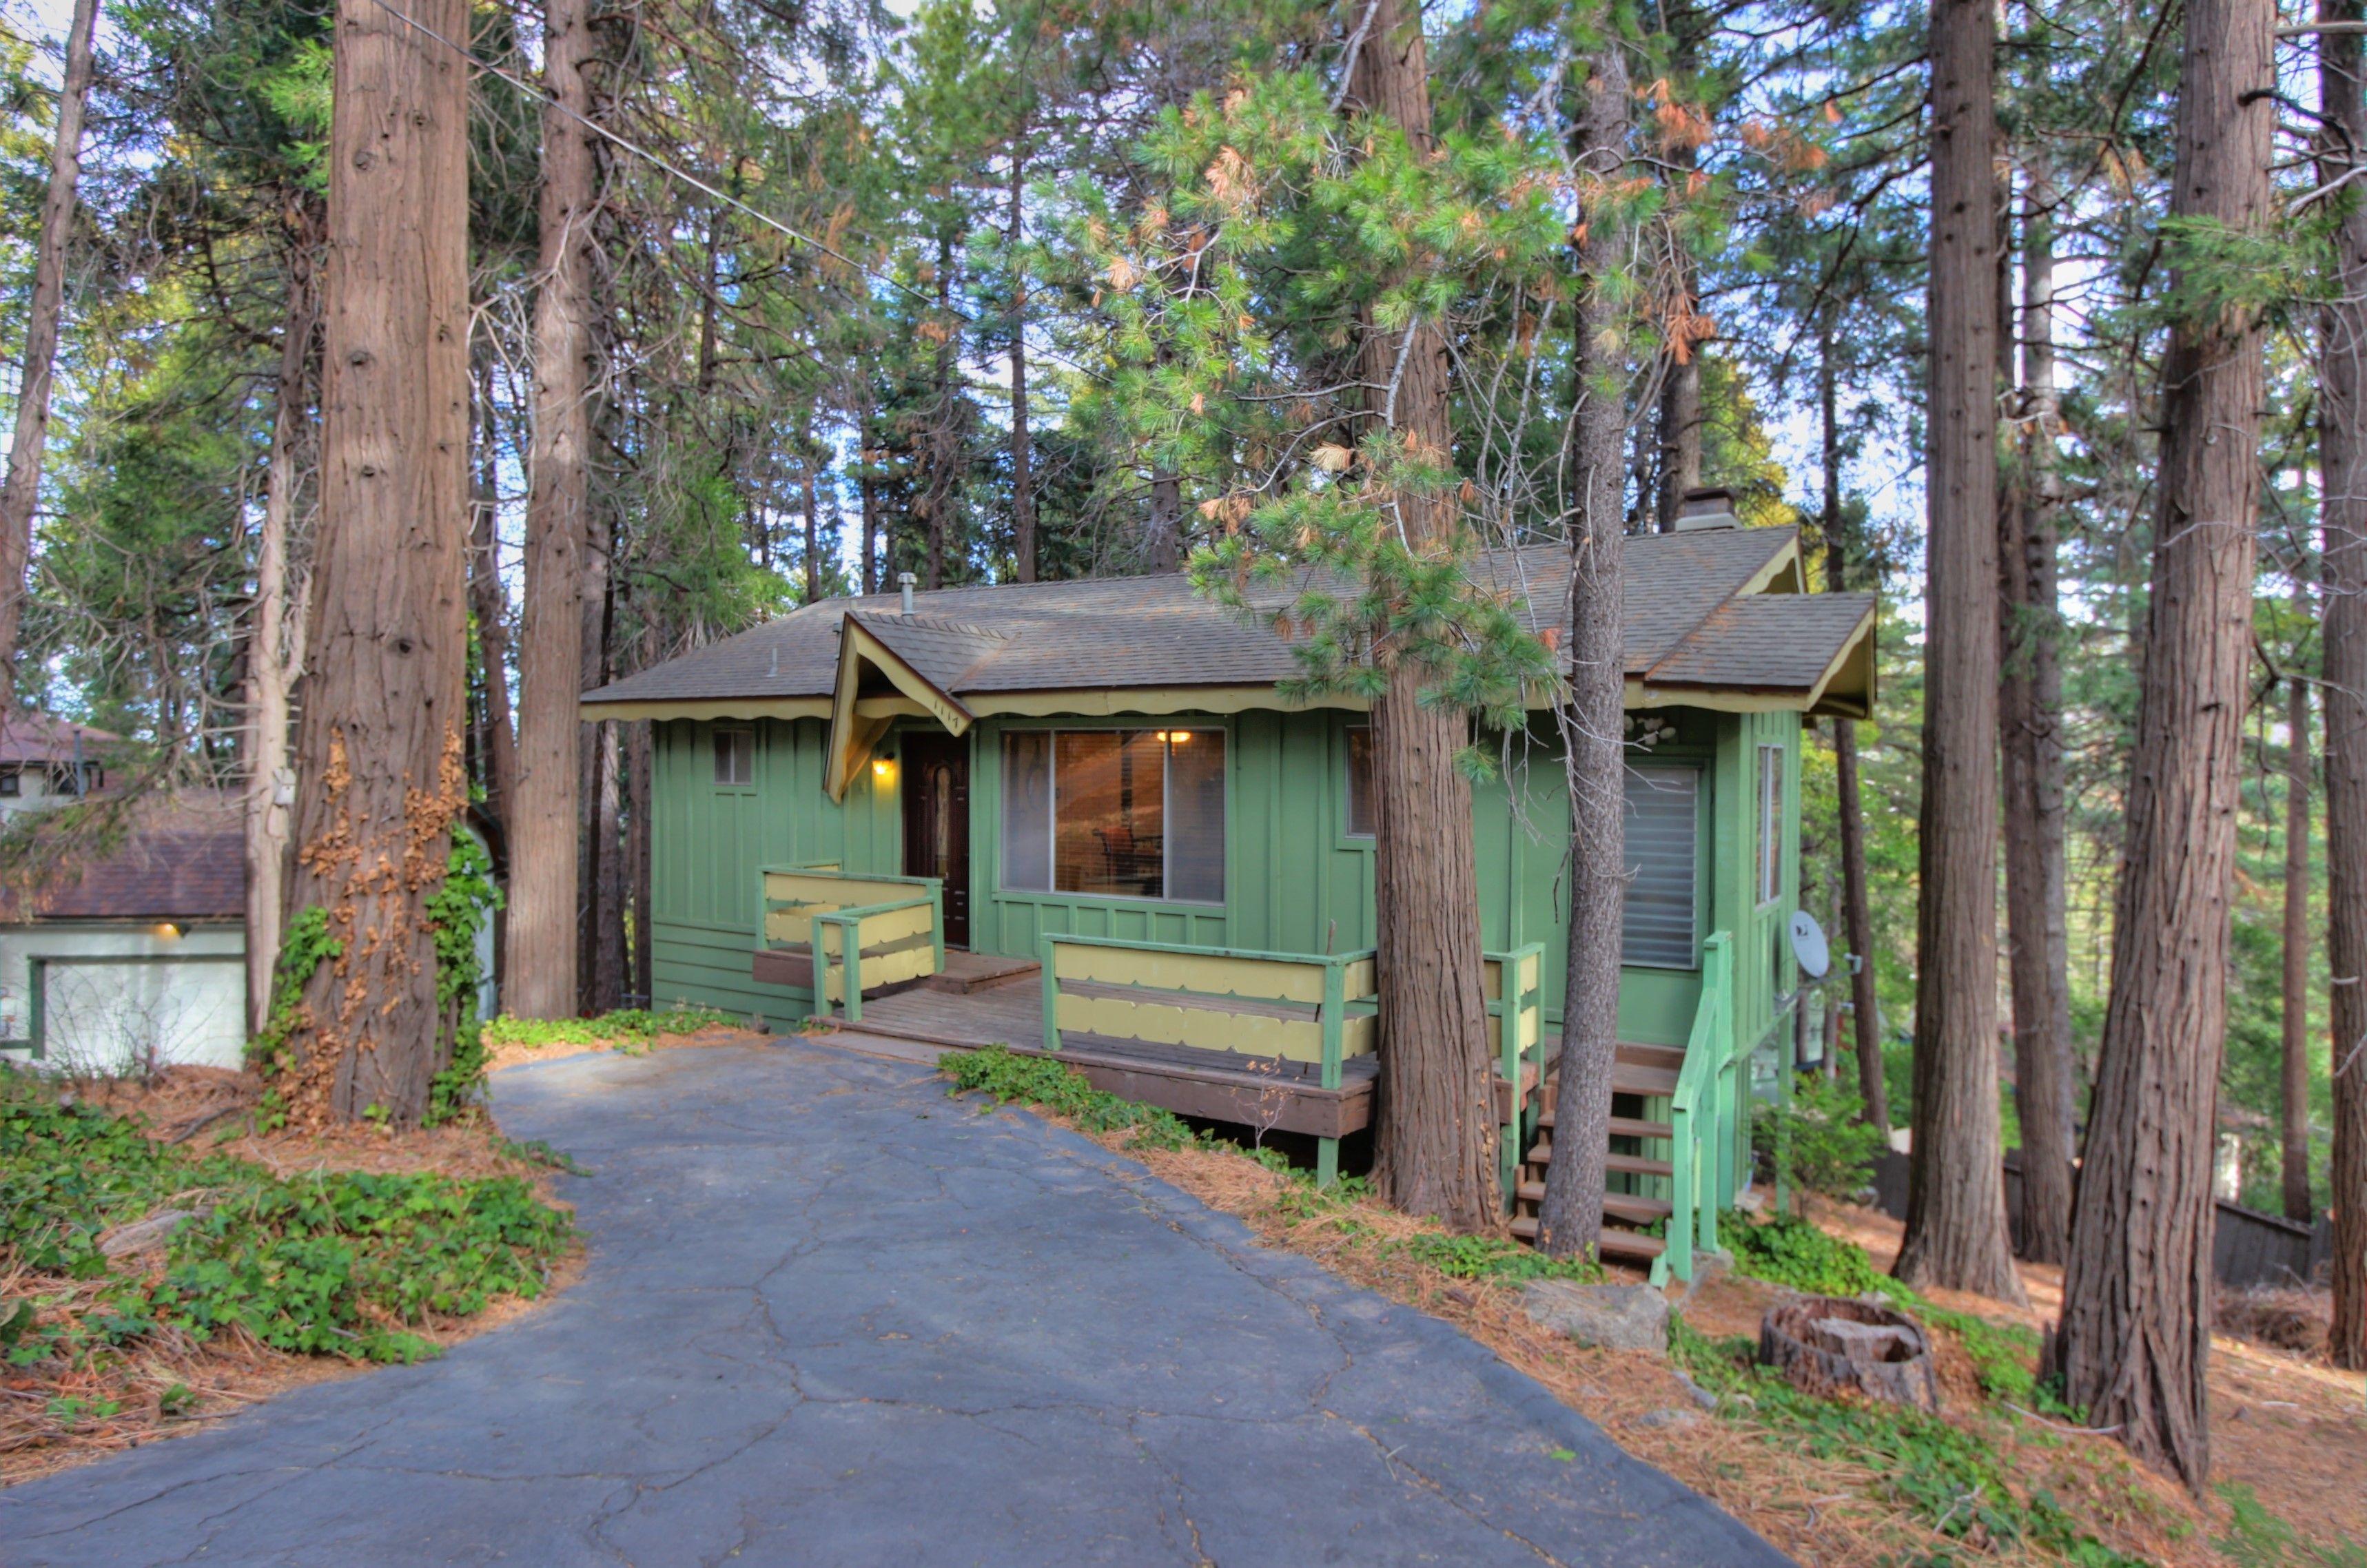 district img lake works senecaville cabins ohio seneca civil recreation missions huntington